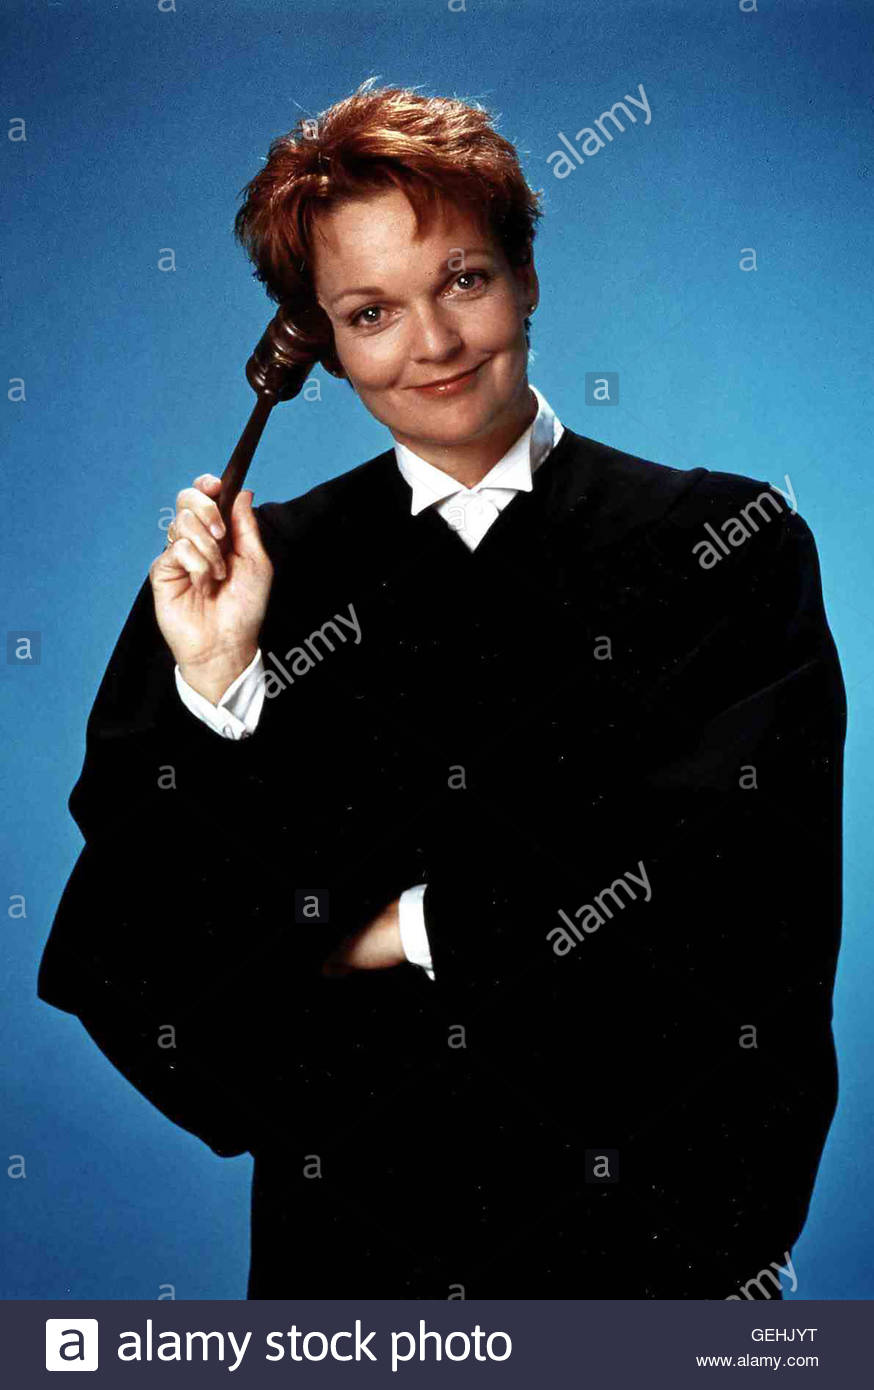 pamela-reed-1995-richterin-sydney-j-solomon-pamela-reed-local-caption-GEHJYT